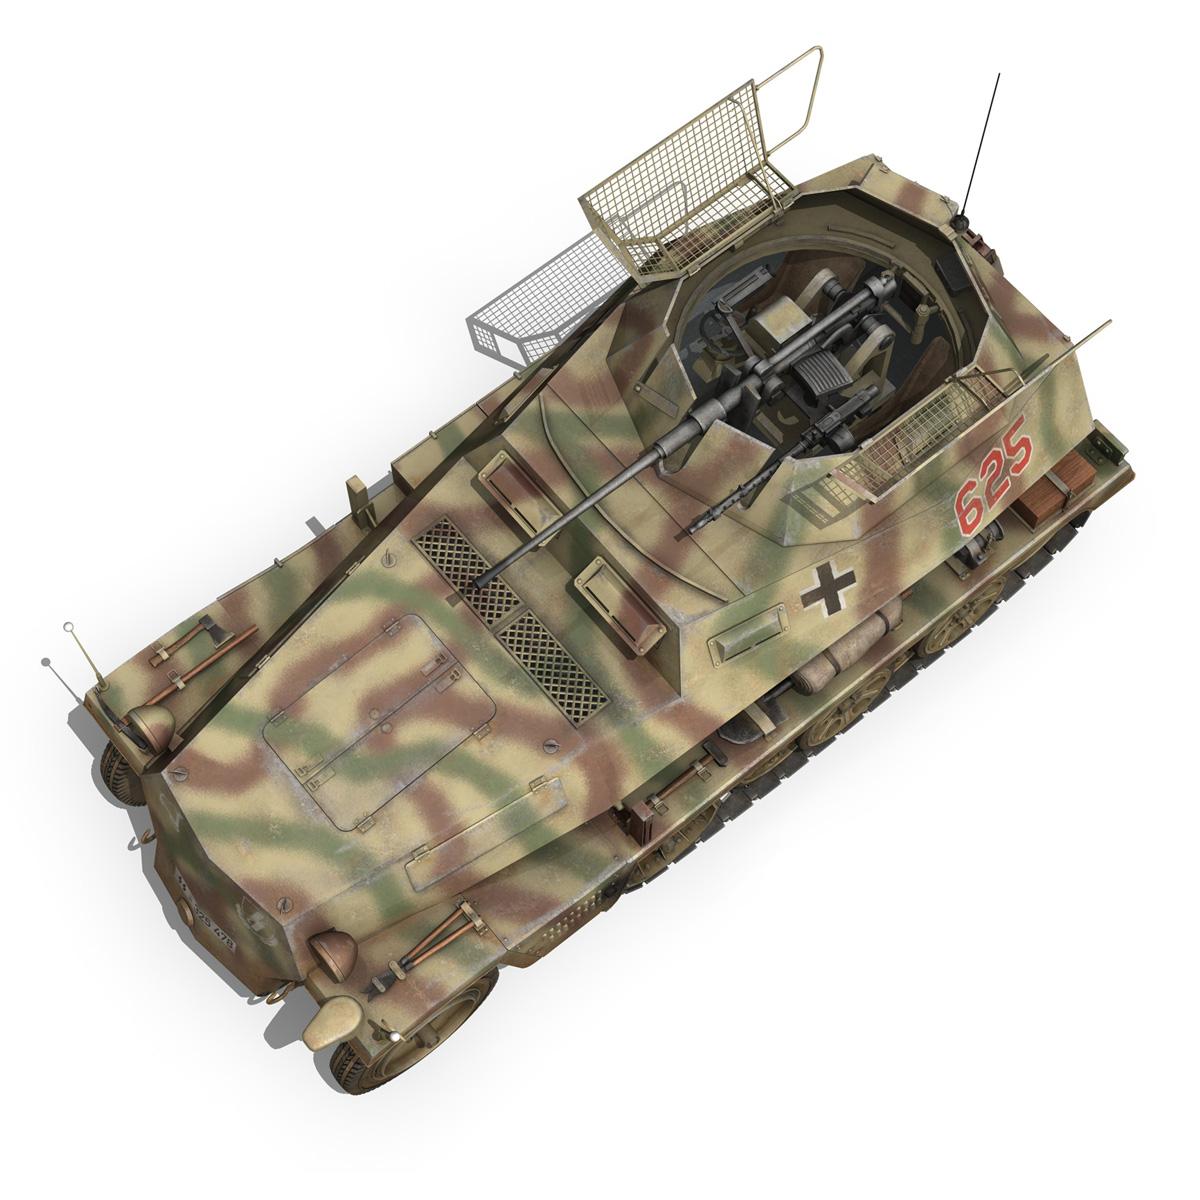 sd.kfz 250 9 – half-track armored vehicle 3d model 3ds fbx c4d lwo obj 198218